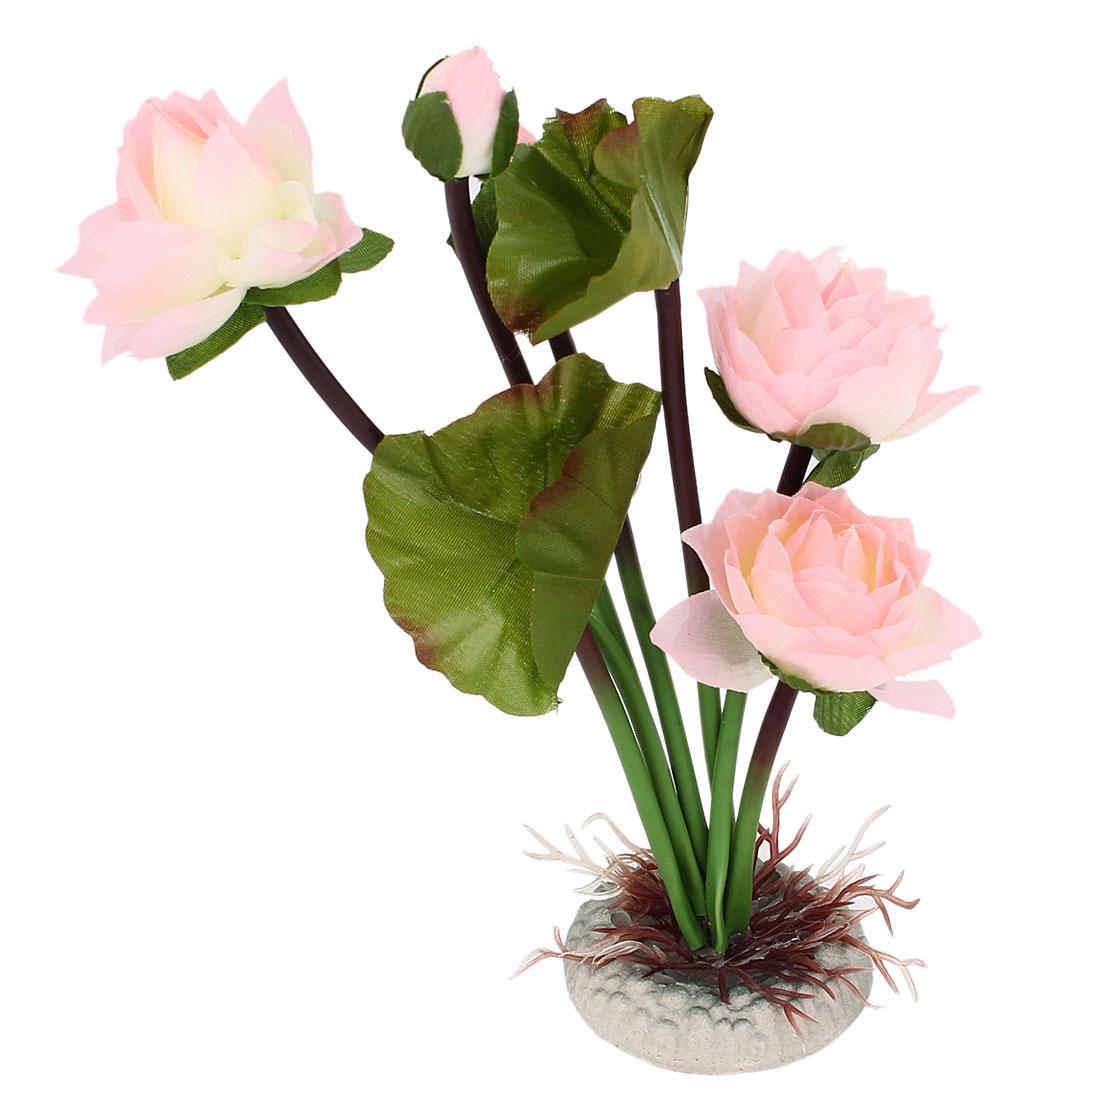 Fish Tank Artificial Pink Lotus Flower Bud Green Leaf